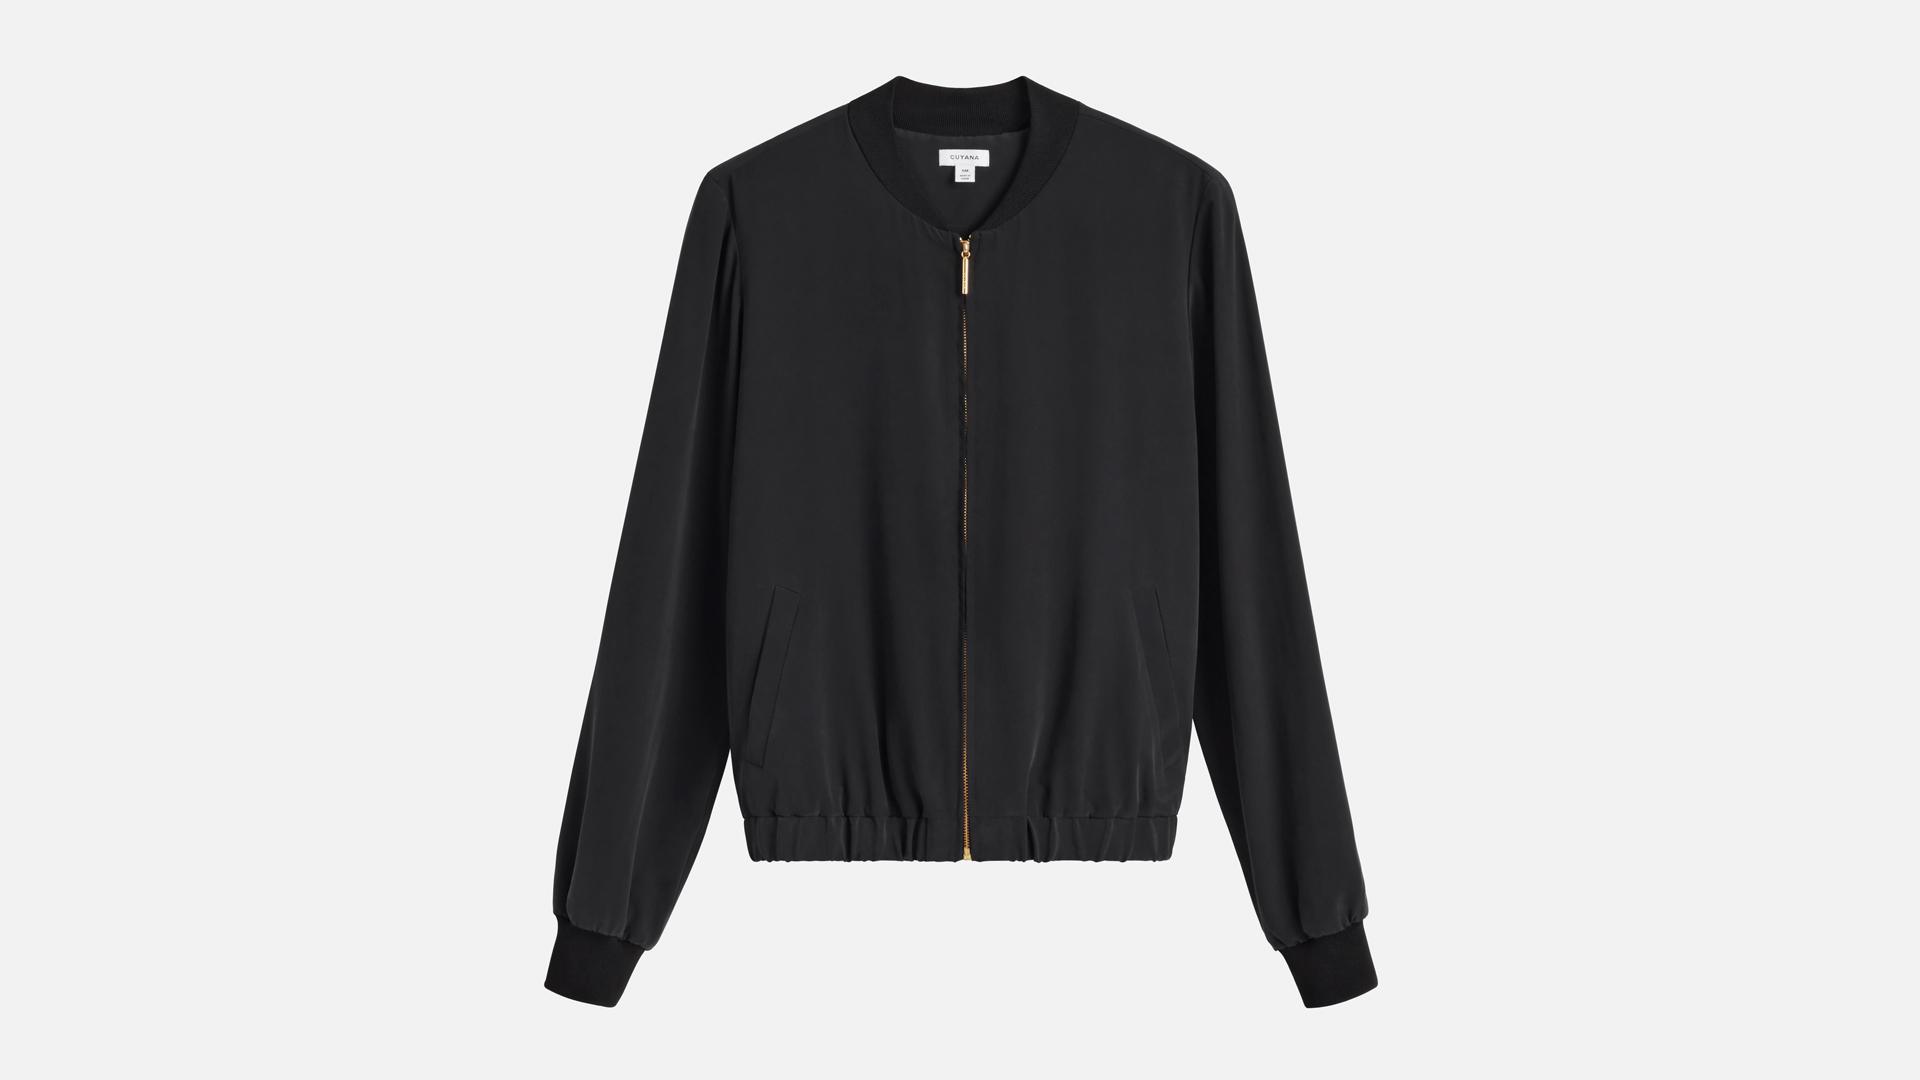 Cuyana Silk Bomber Jacket